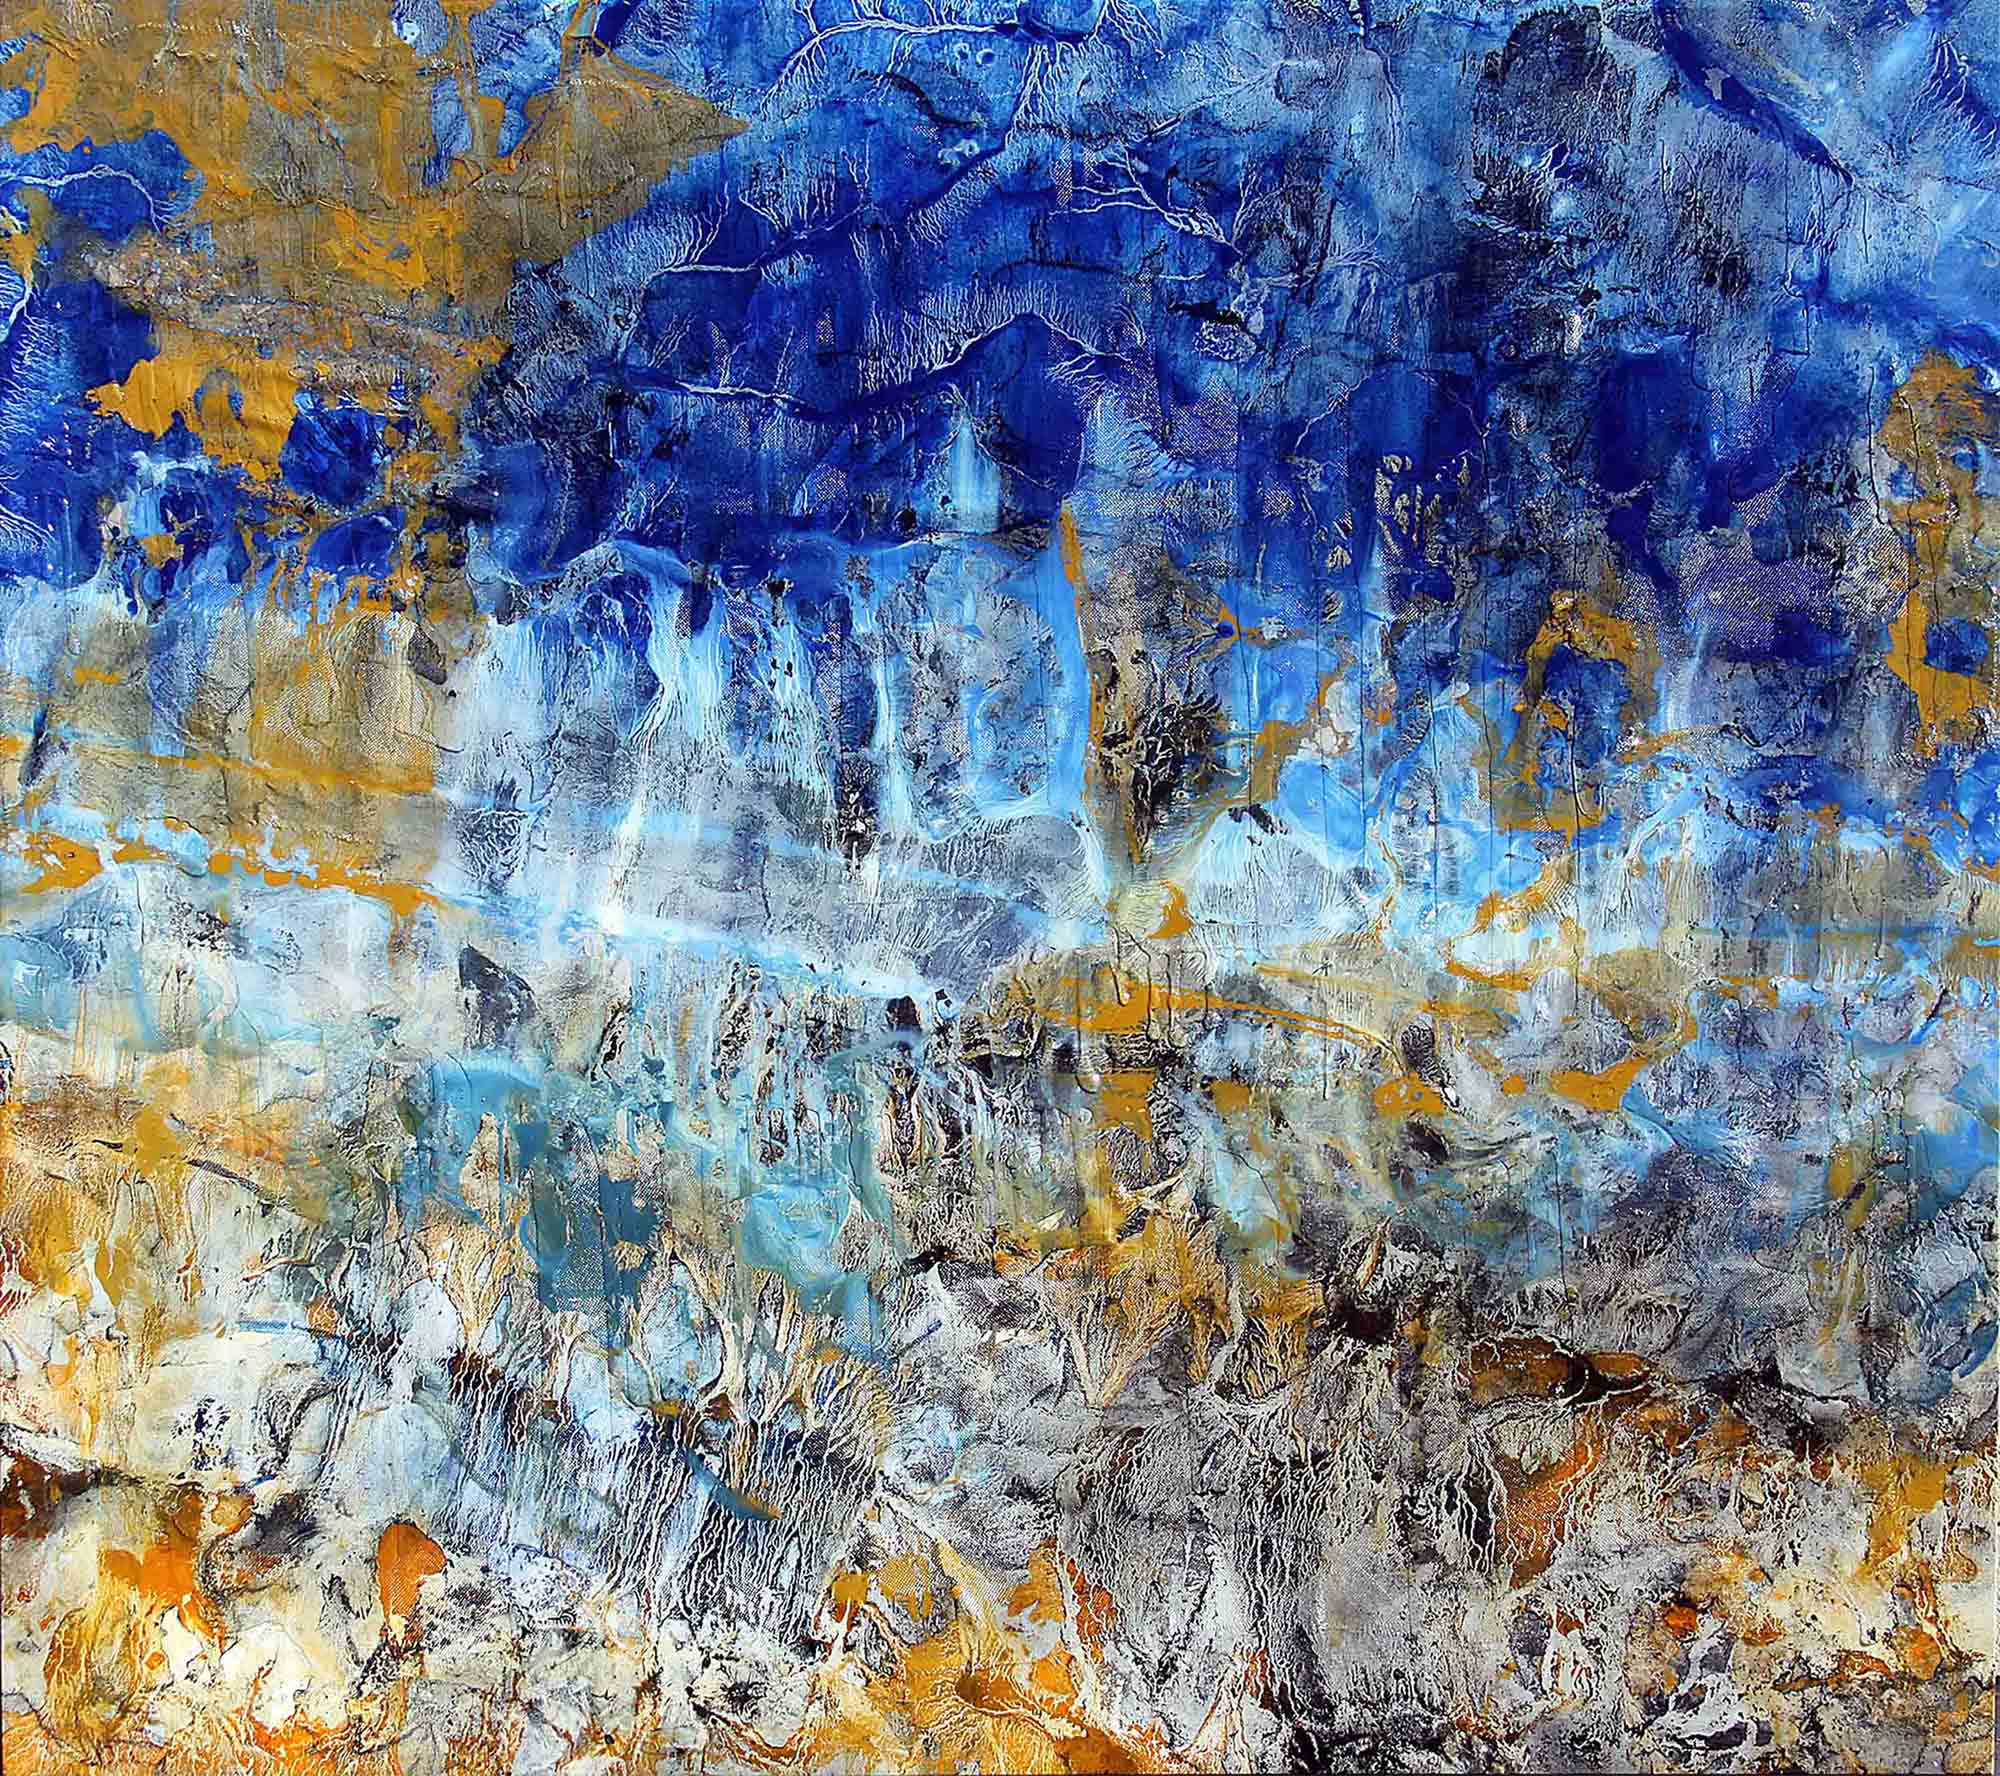 - Tidepools 1 Oil, Resin & Fiberglass on Canvas Herbie Fletcher Shimmering Tides At LA Perouse Bay IMG_8989-CC-C TEXT 8 P2.jpg